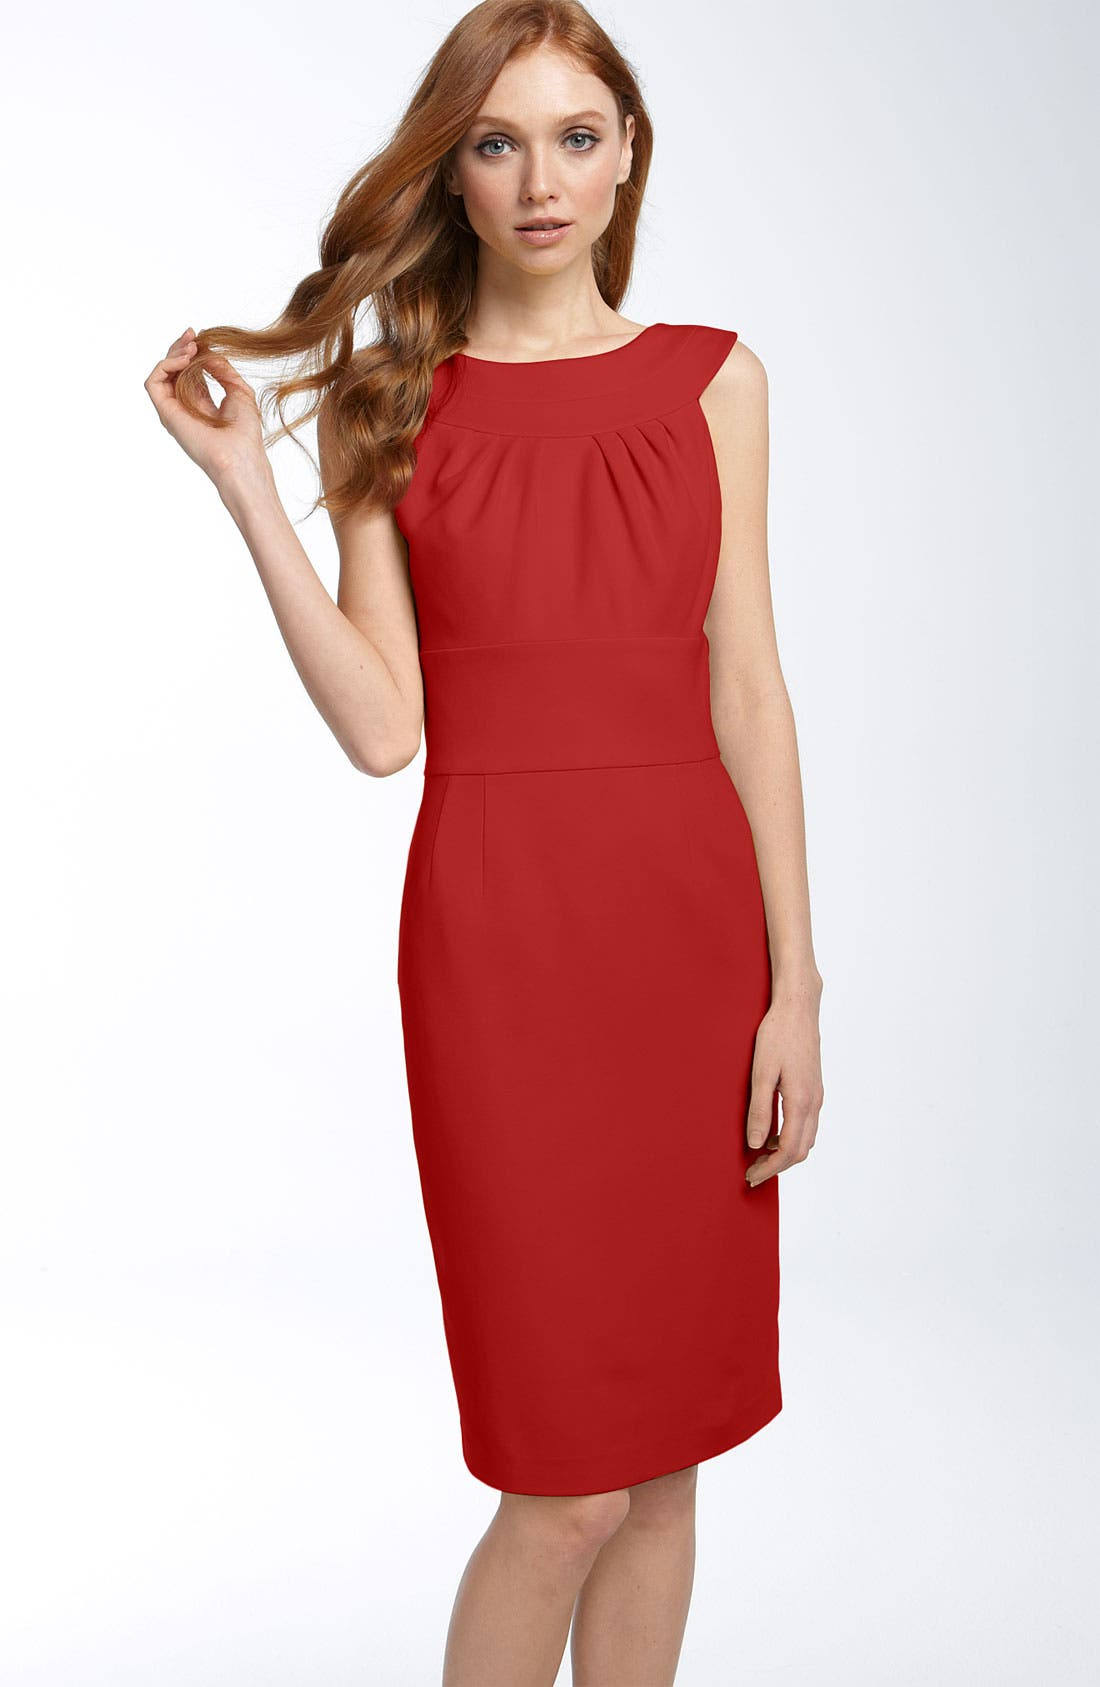 Alternate Image 1 Selected - Trina Turk 'Etiquette' Dress